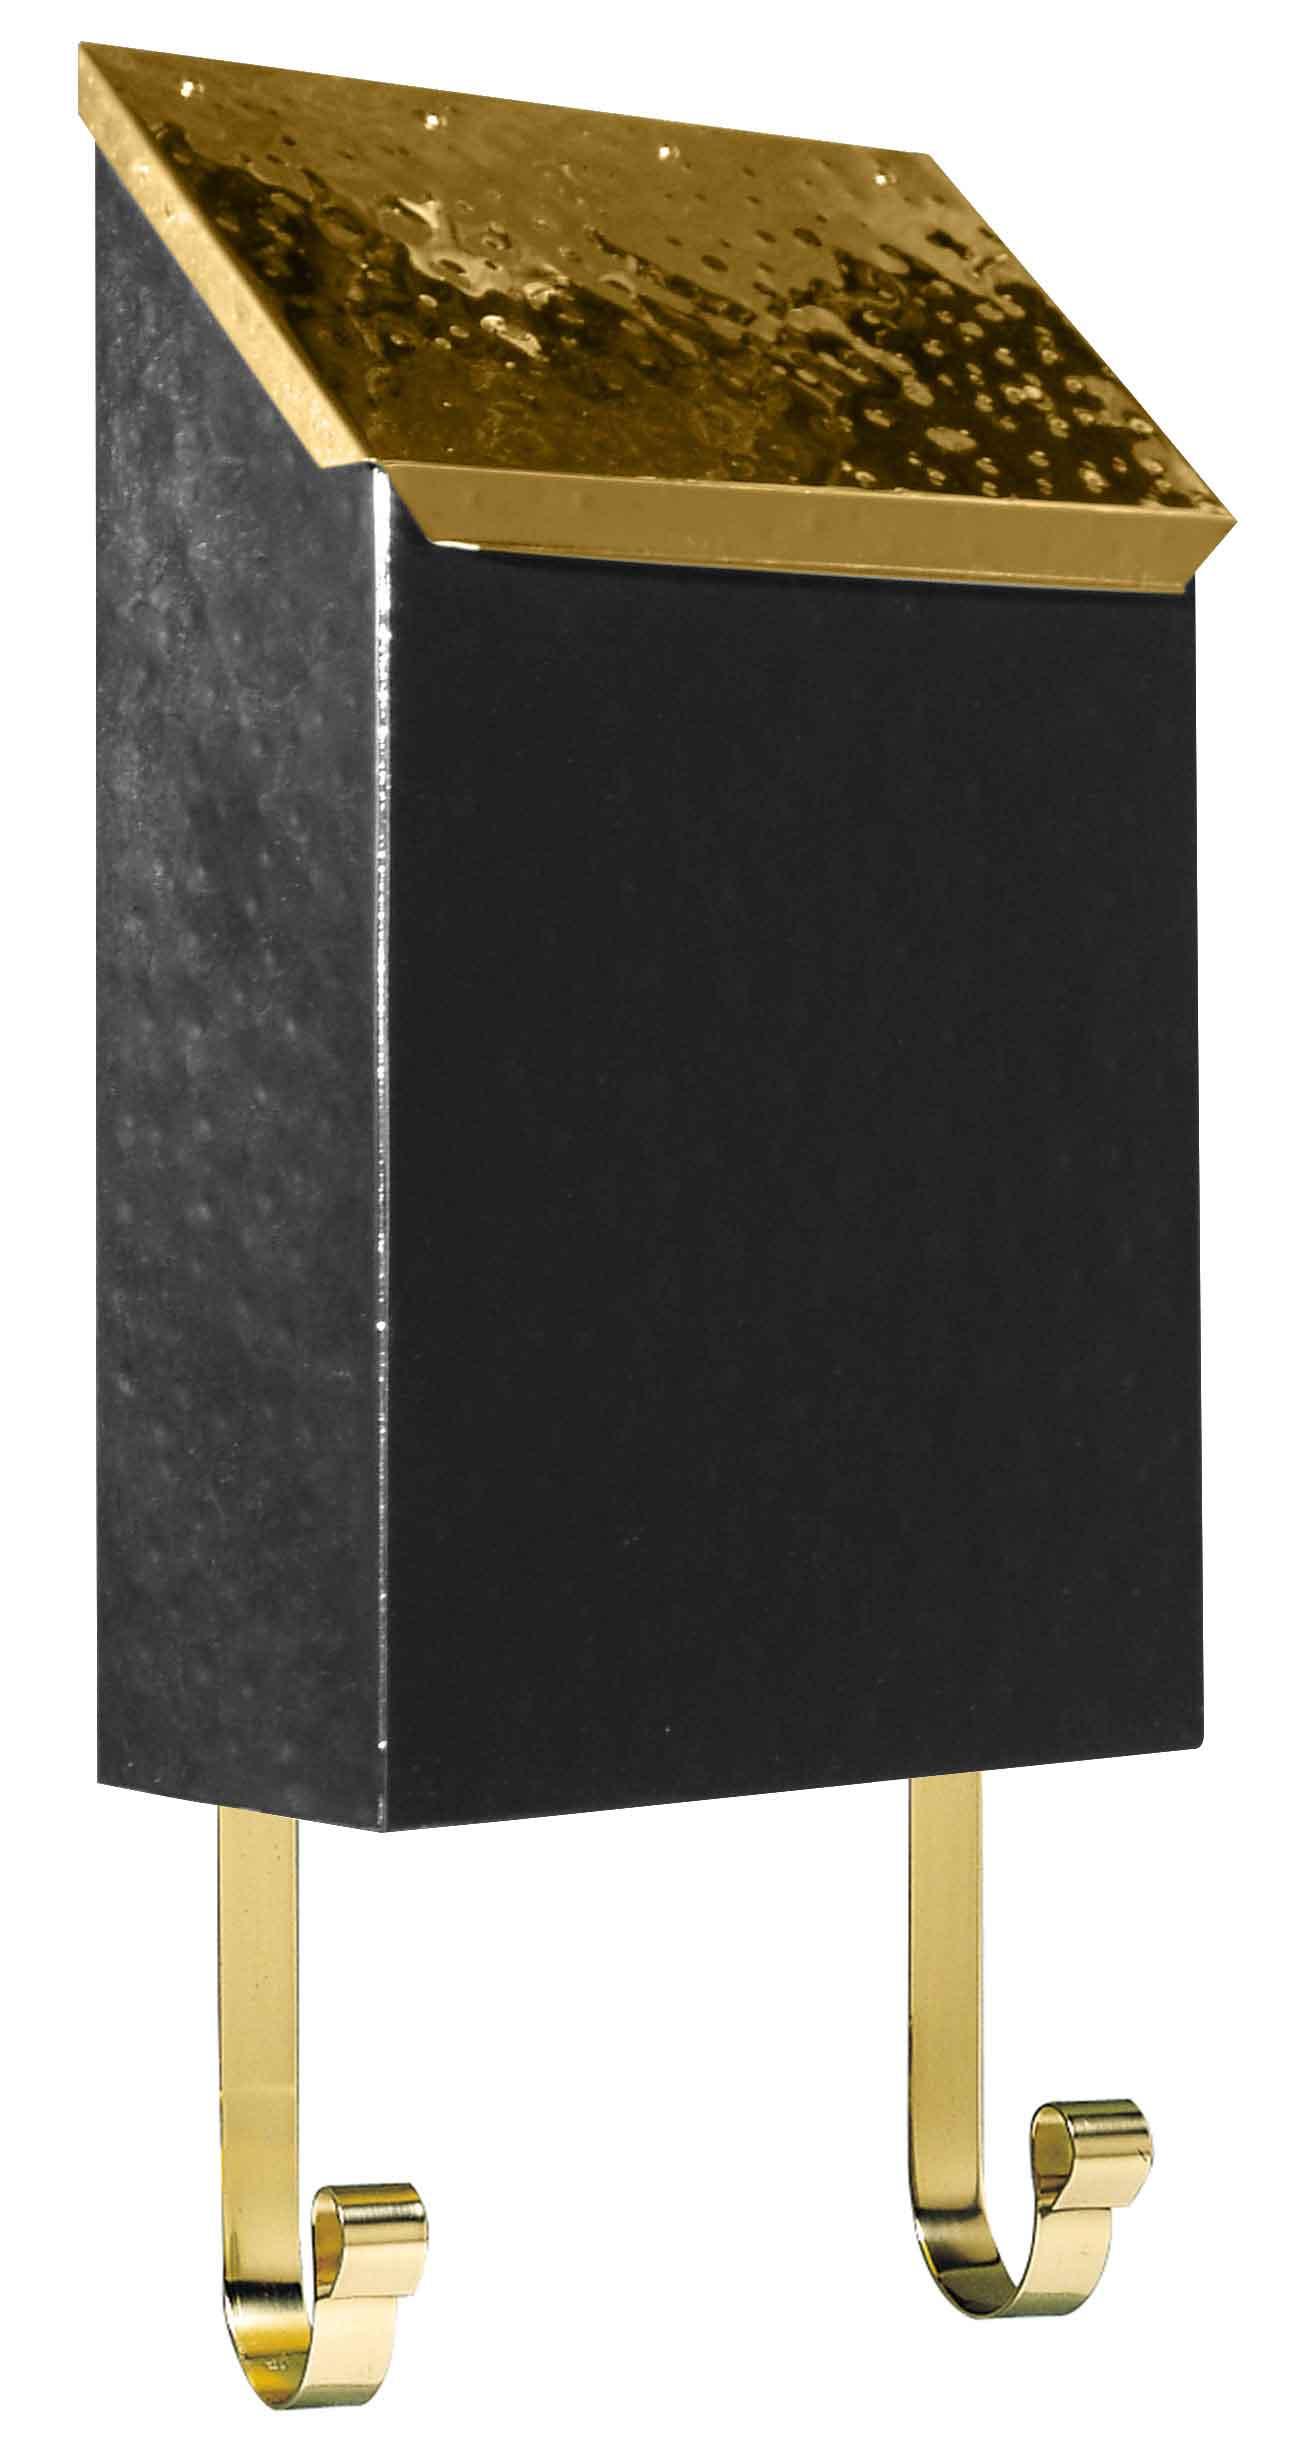 Hammered Black Amp Brass Vertical Wall Mailbox Mailbox